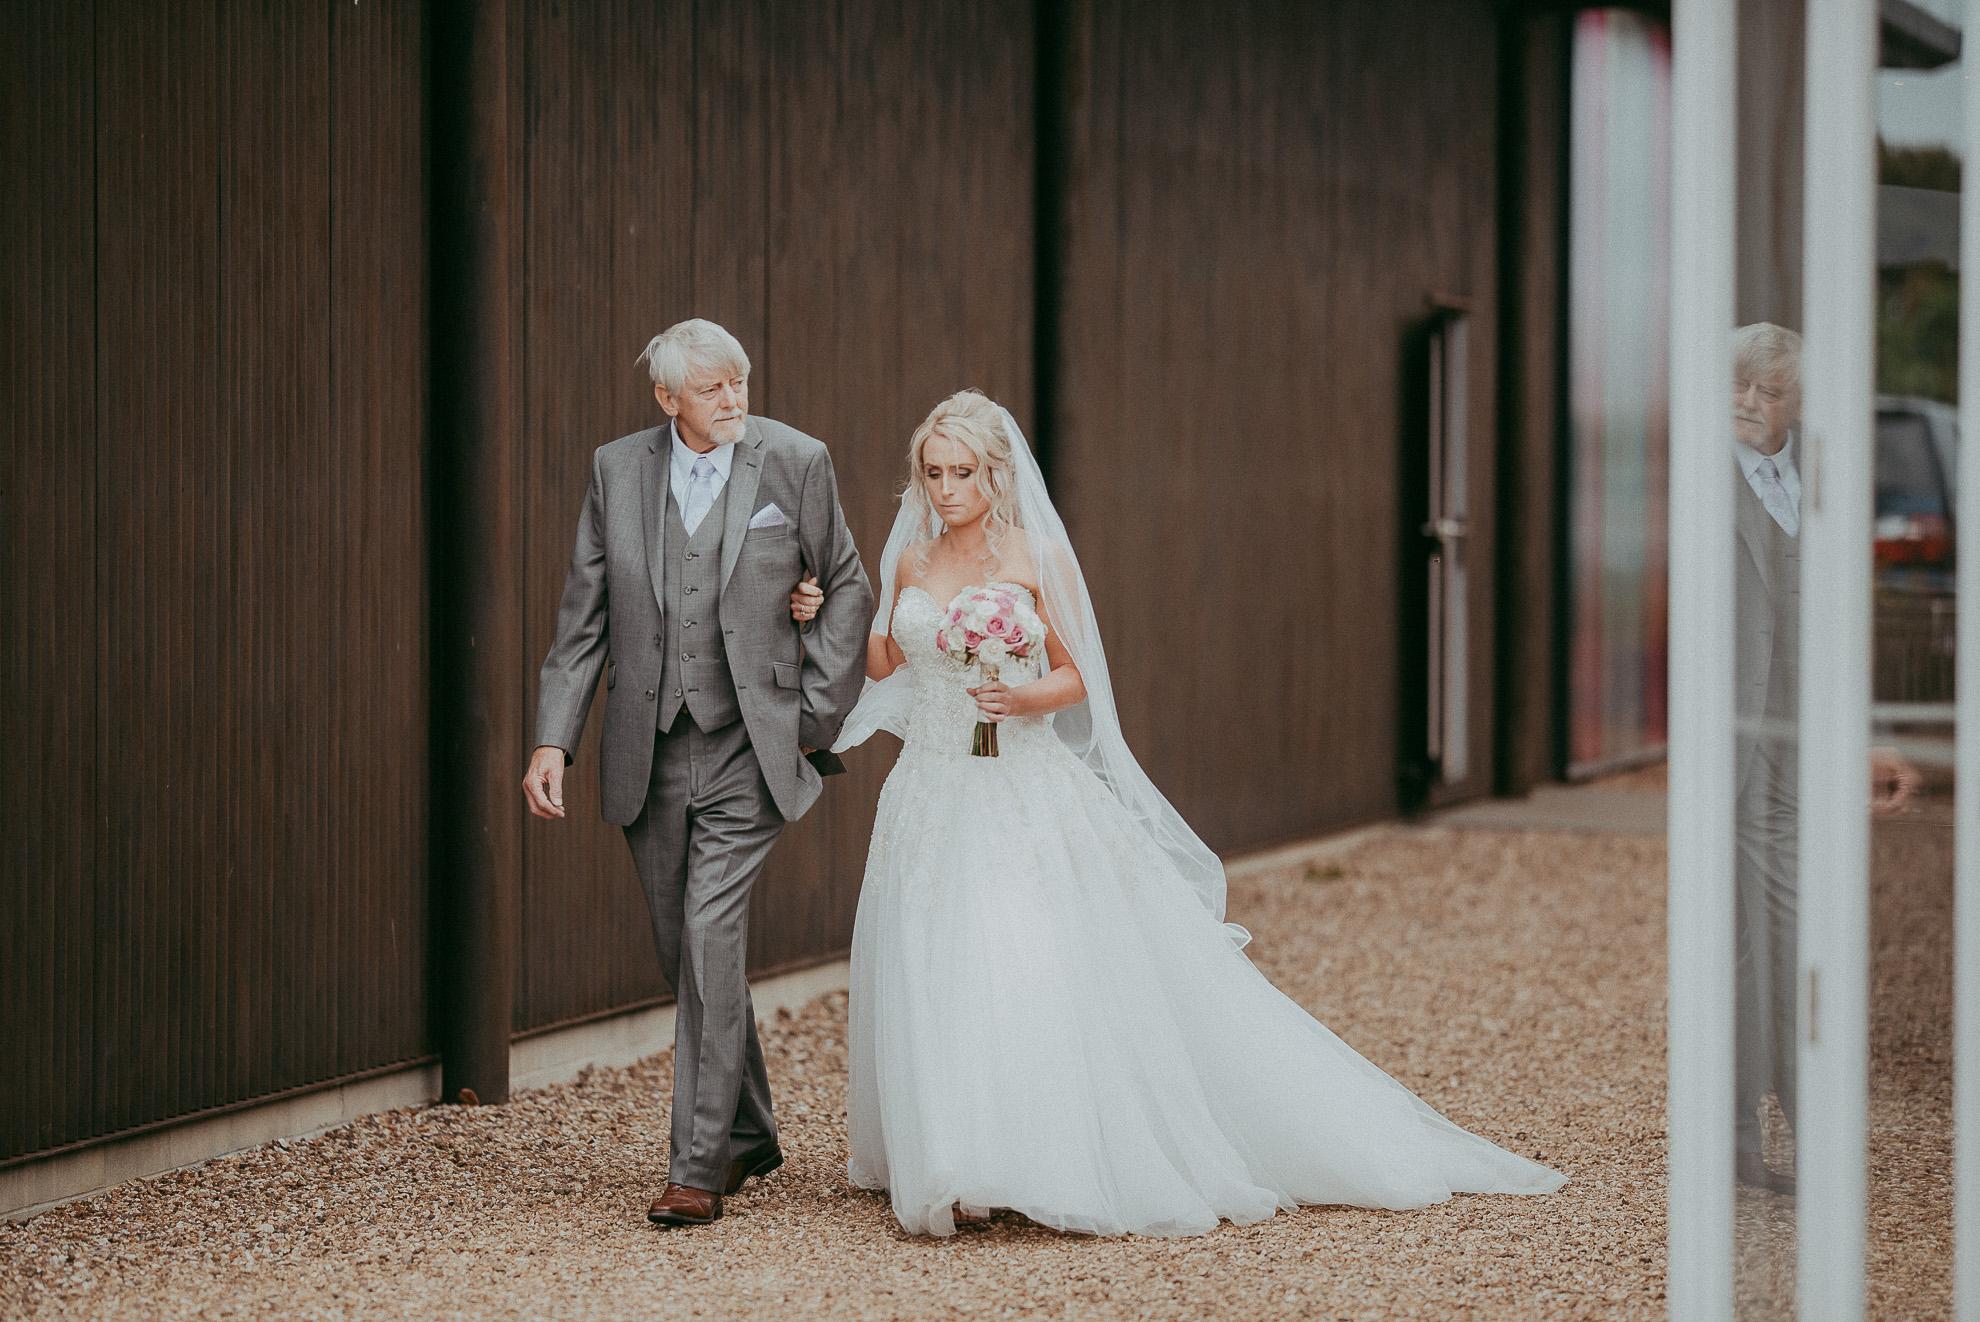 wedding-by-levien-298.JPG